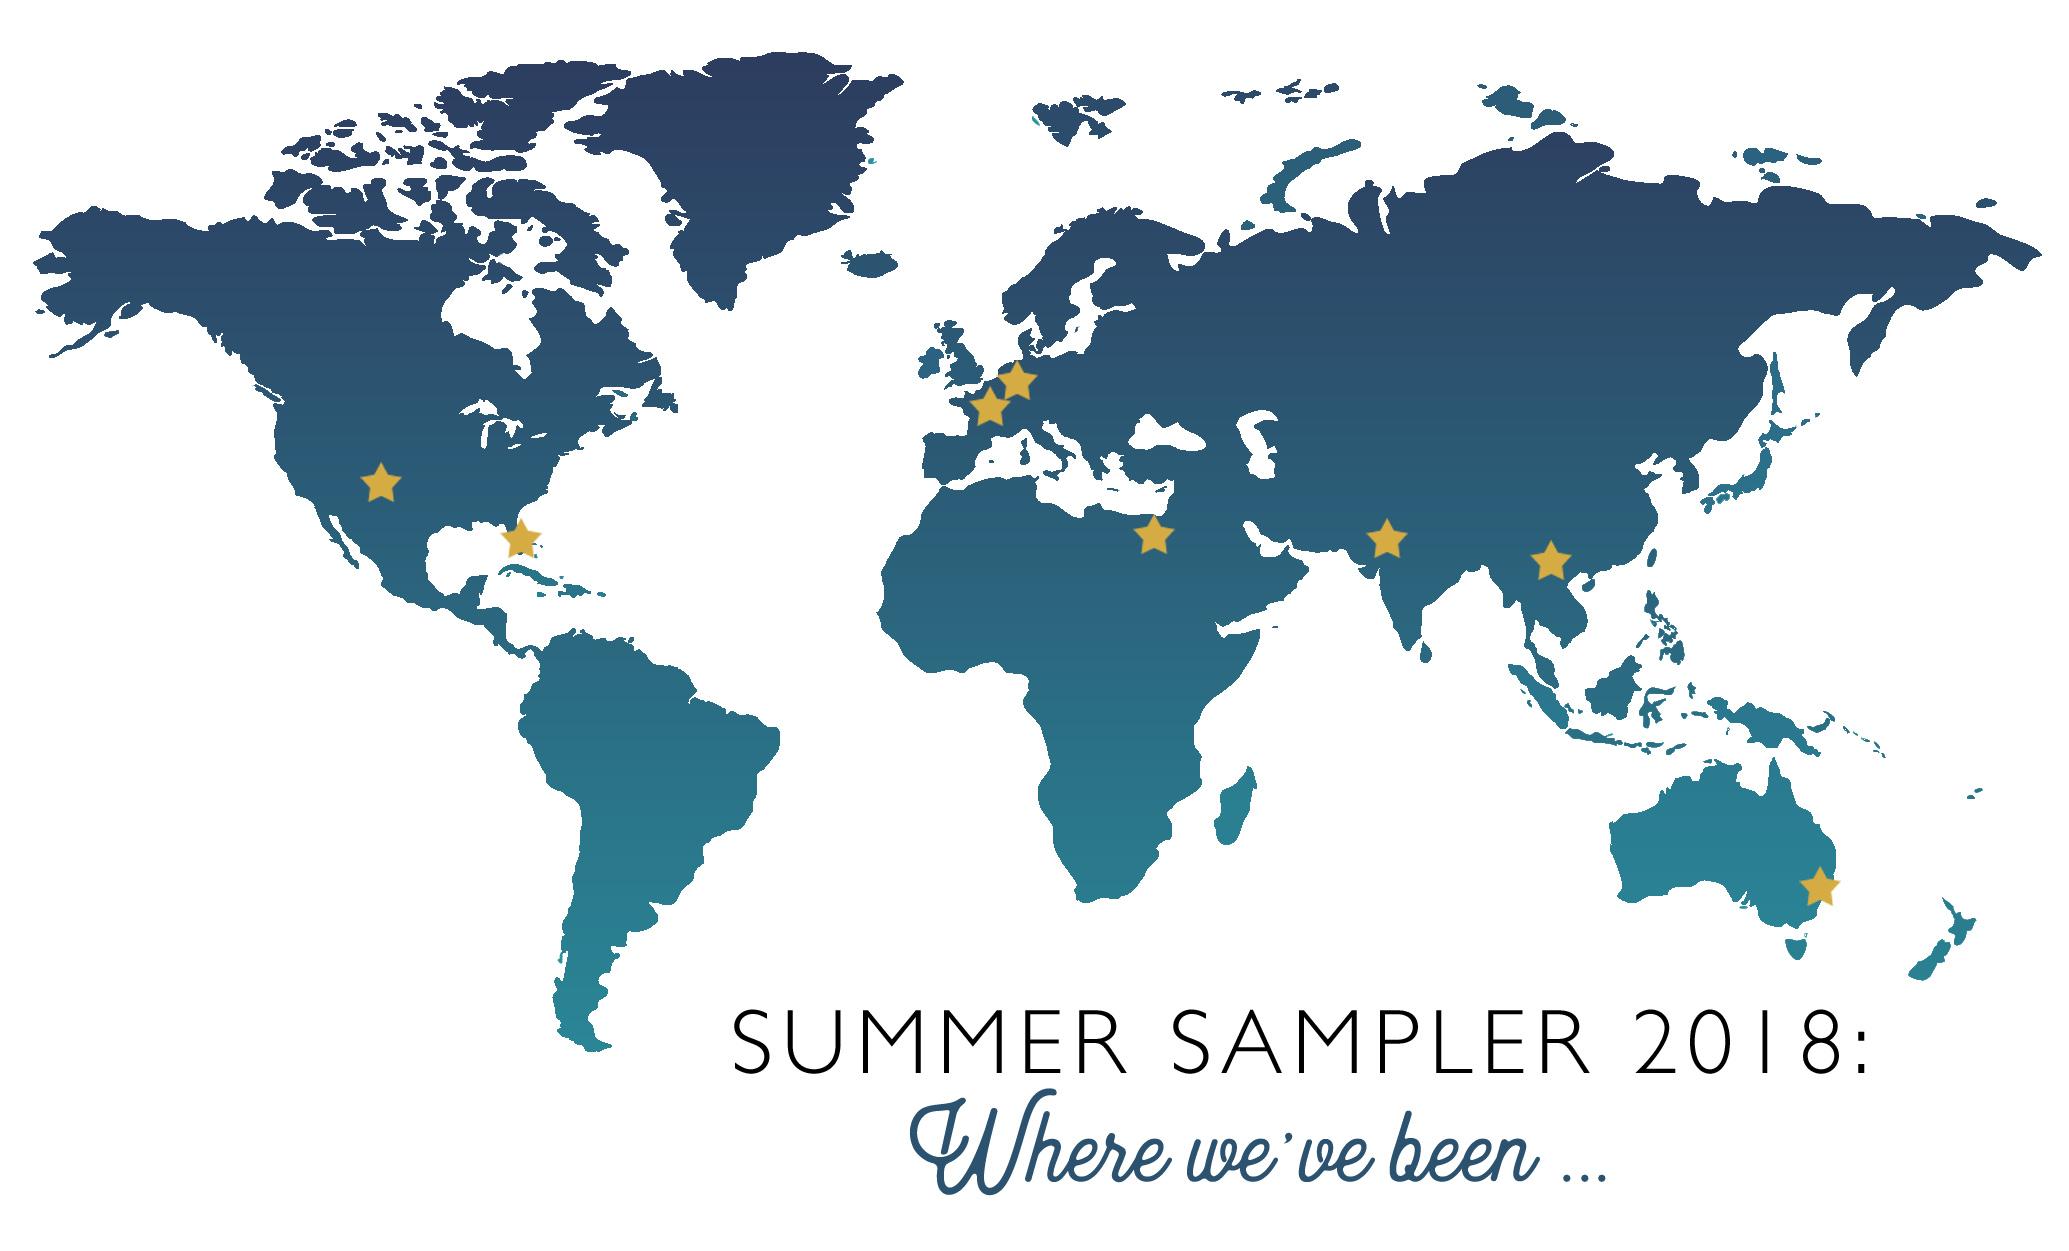 Summer Sampler Series 2018